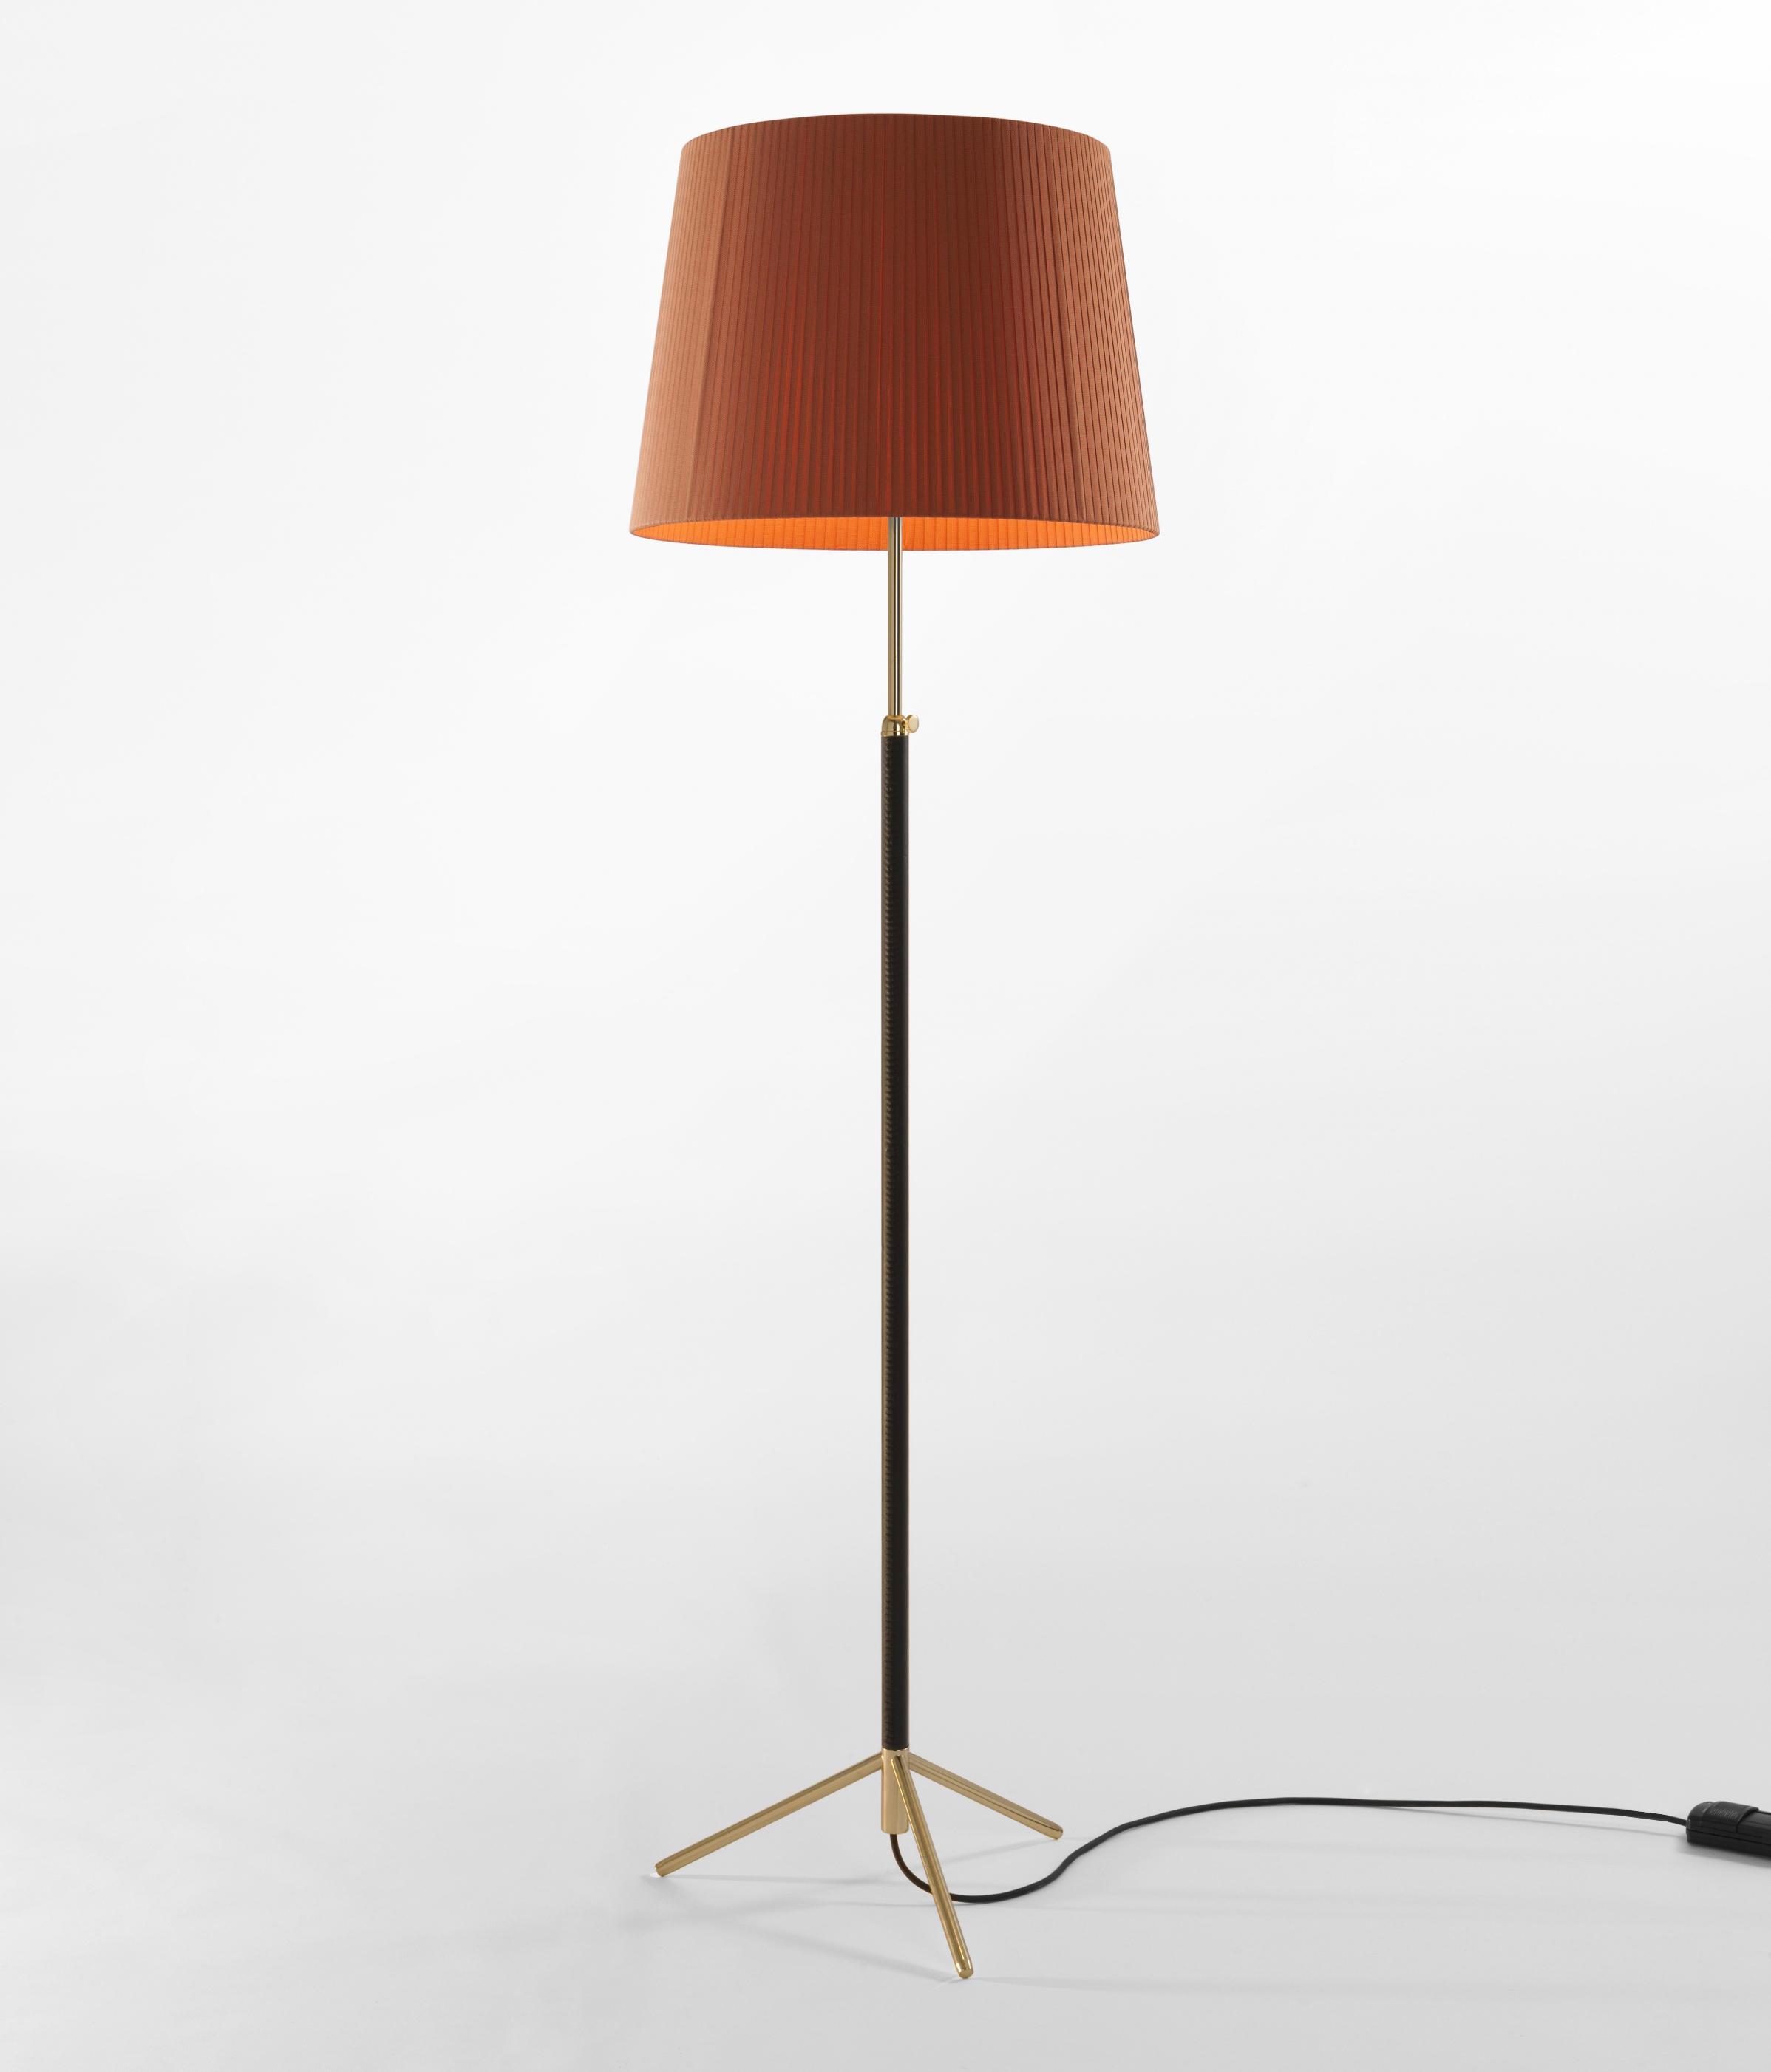 Pie de sal n g1 floor lamp general lighting from - Lamparas pie salon ...